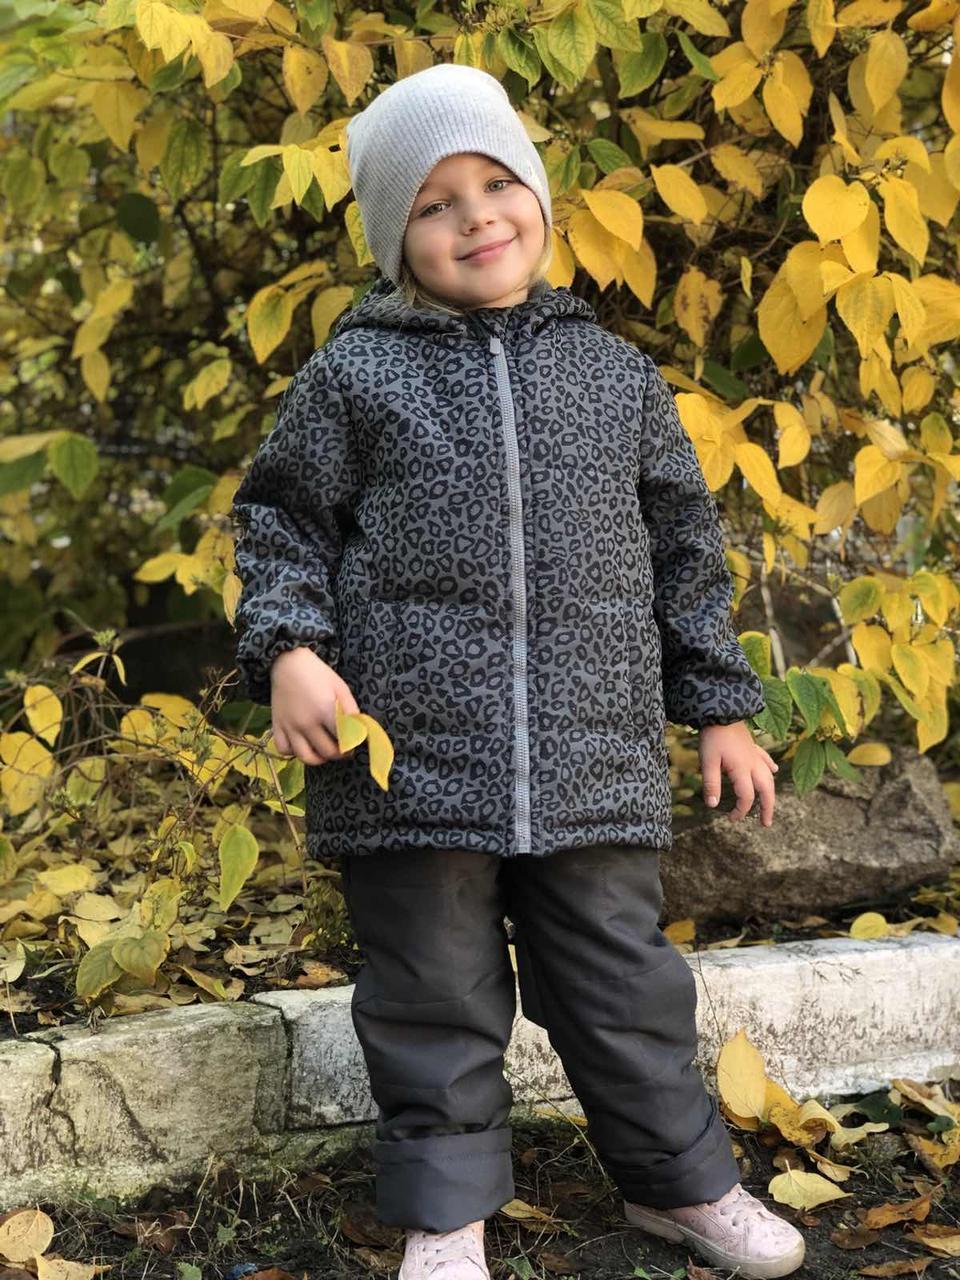 Зимний детский костюм курточка+штаны Принт Леопард+серый